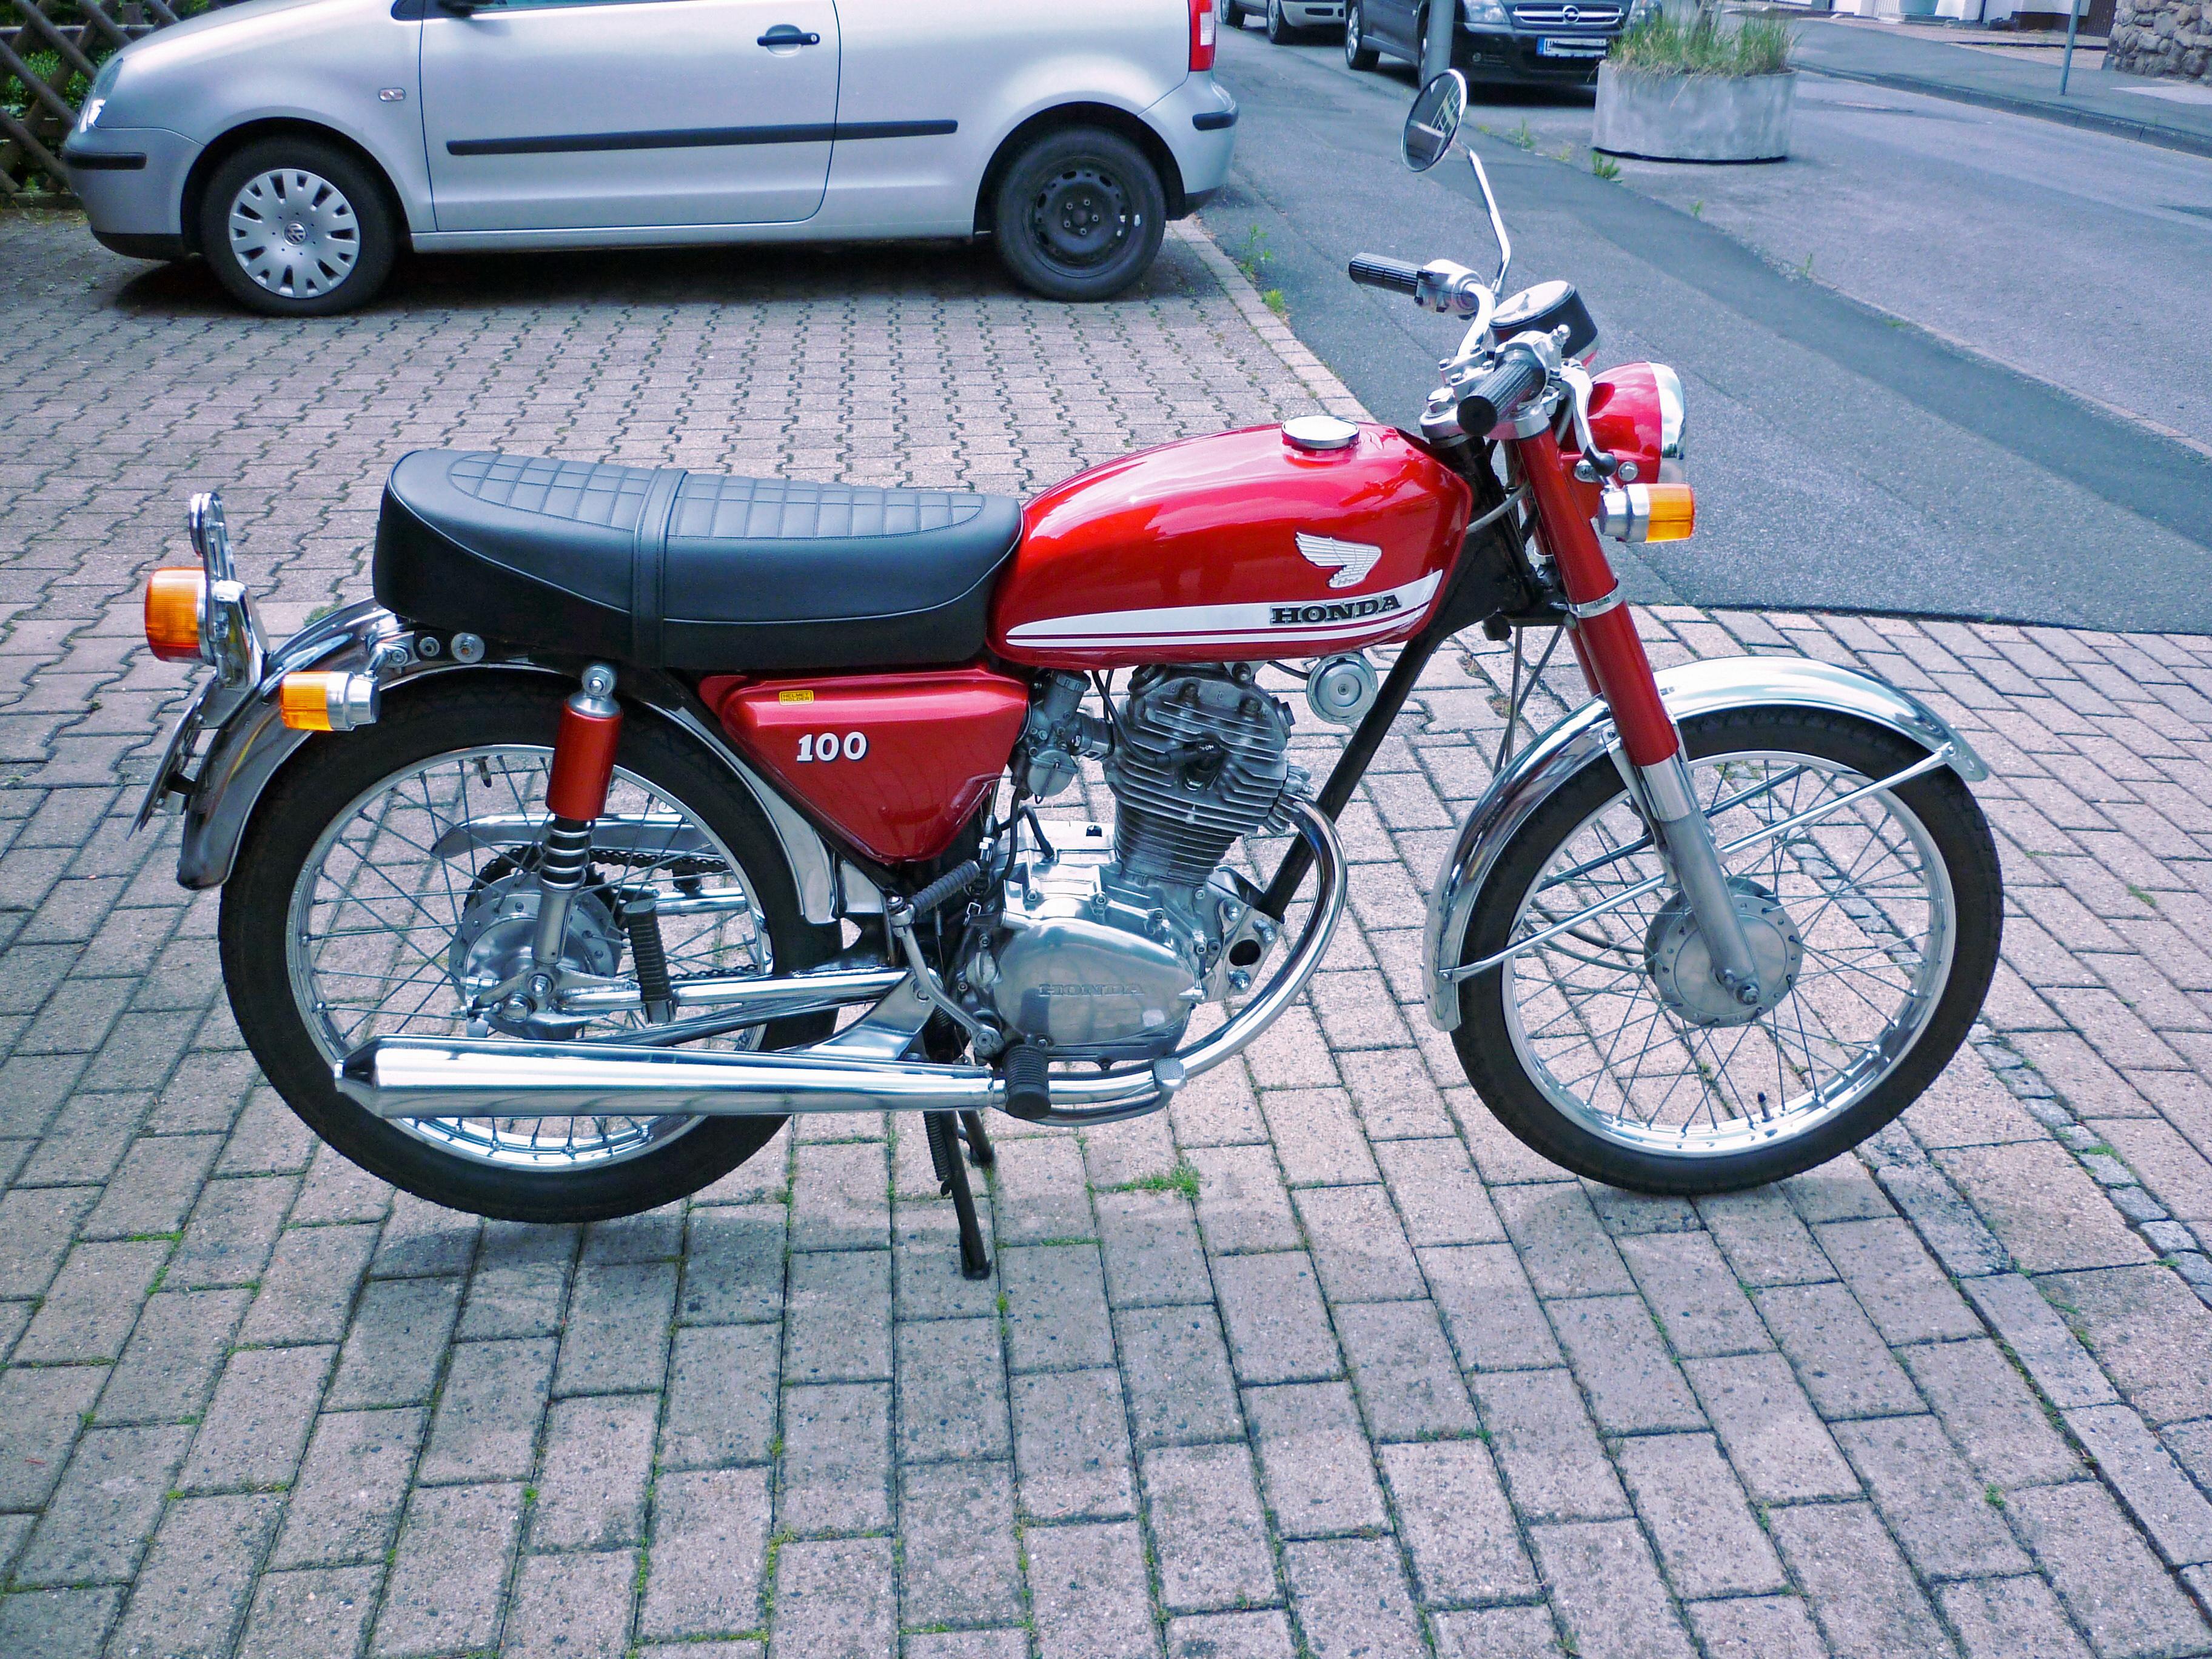 File:1970 Honda CB 100, right side.jpg